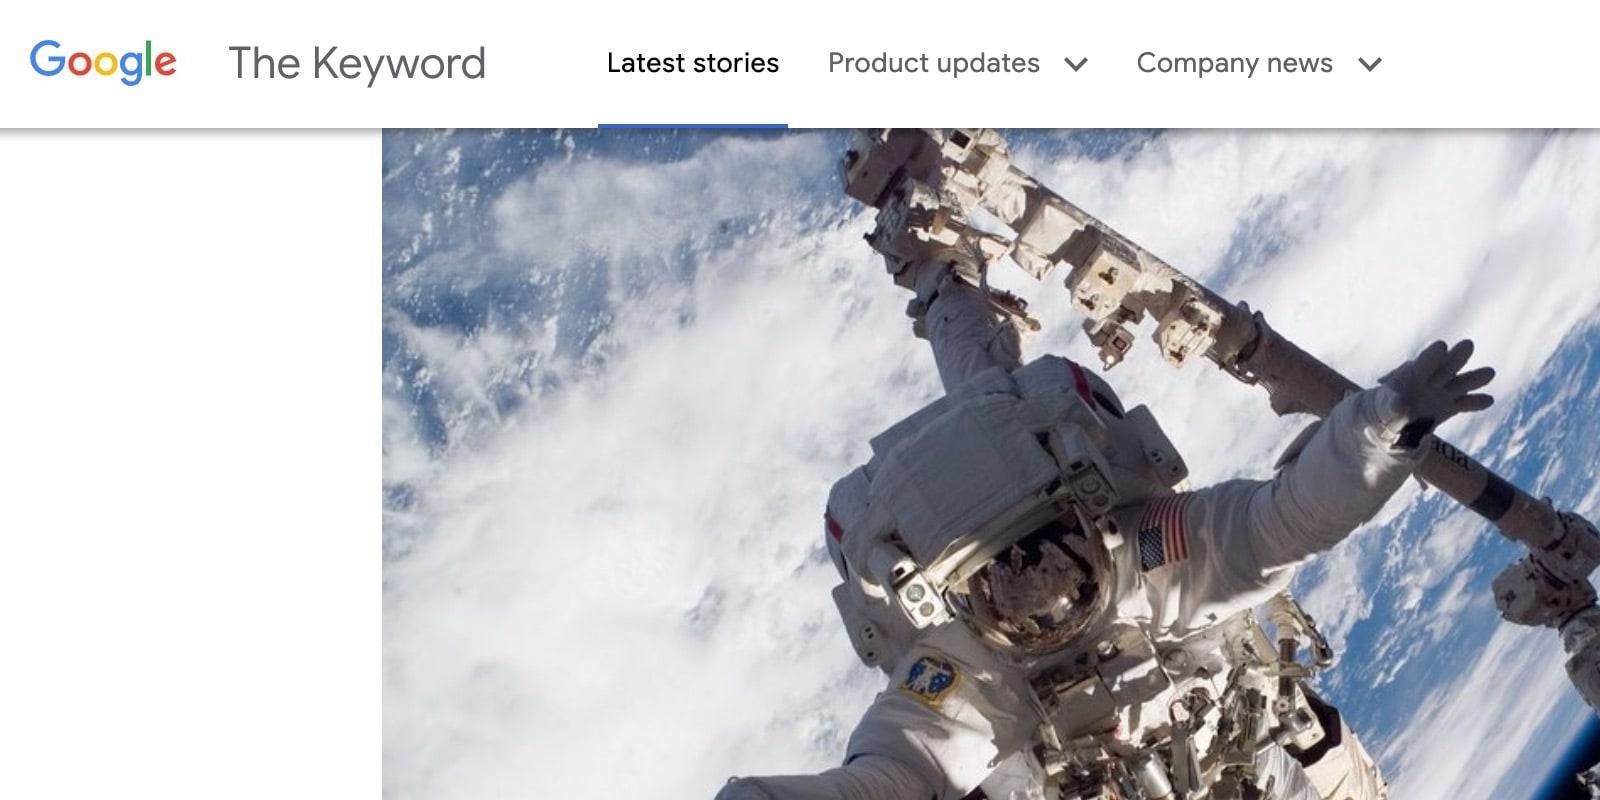 Google Keyword Blog